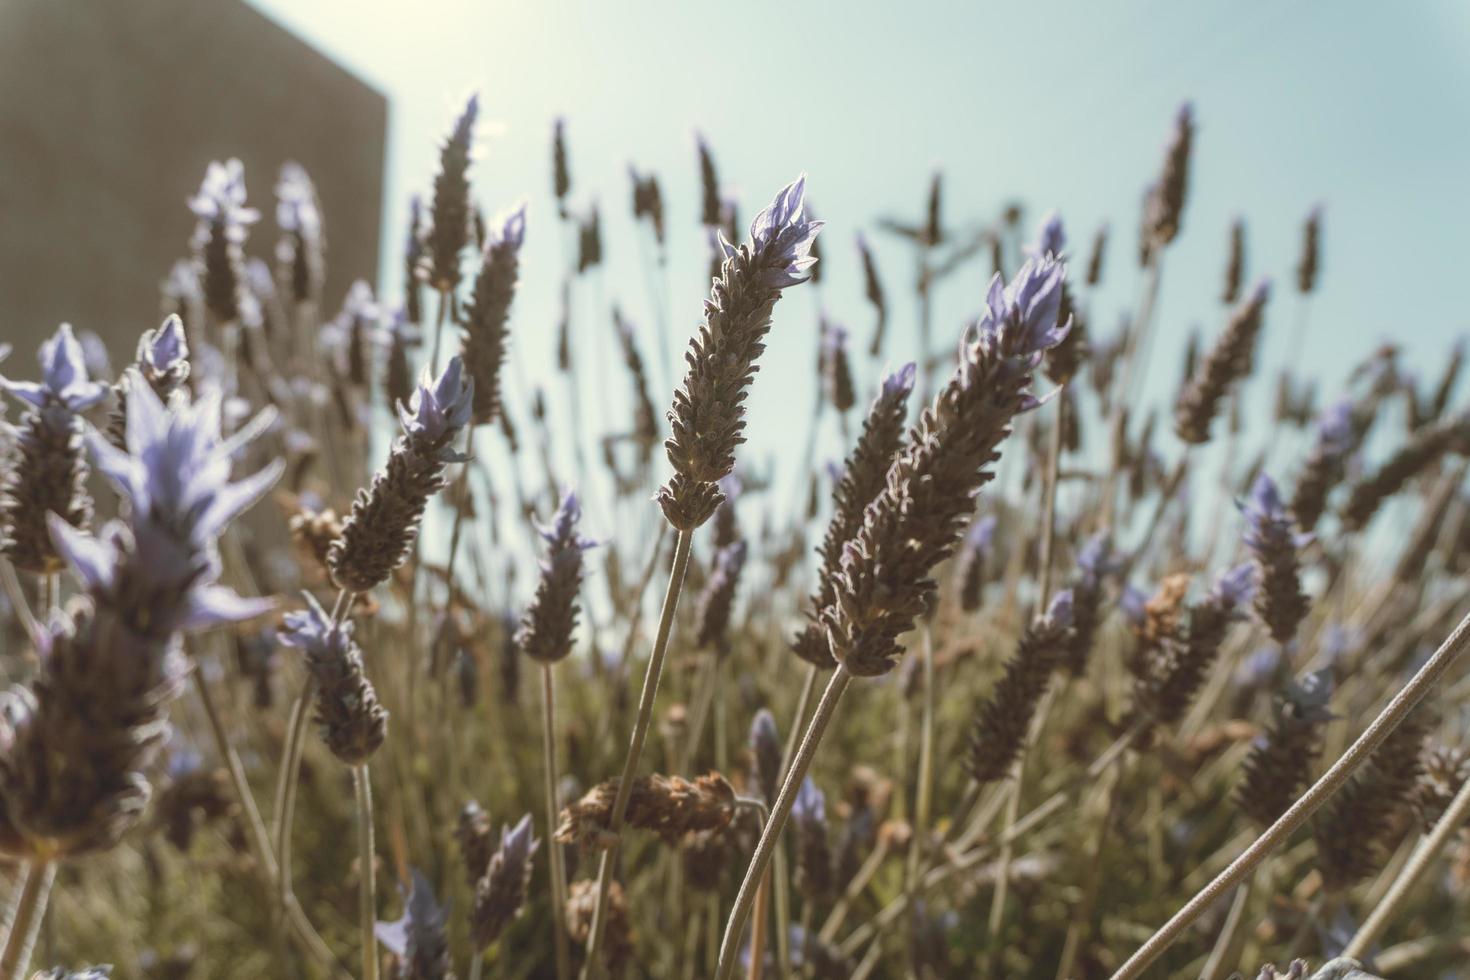 Lavender flowers amongst tall grass photo